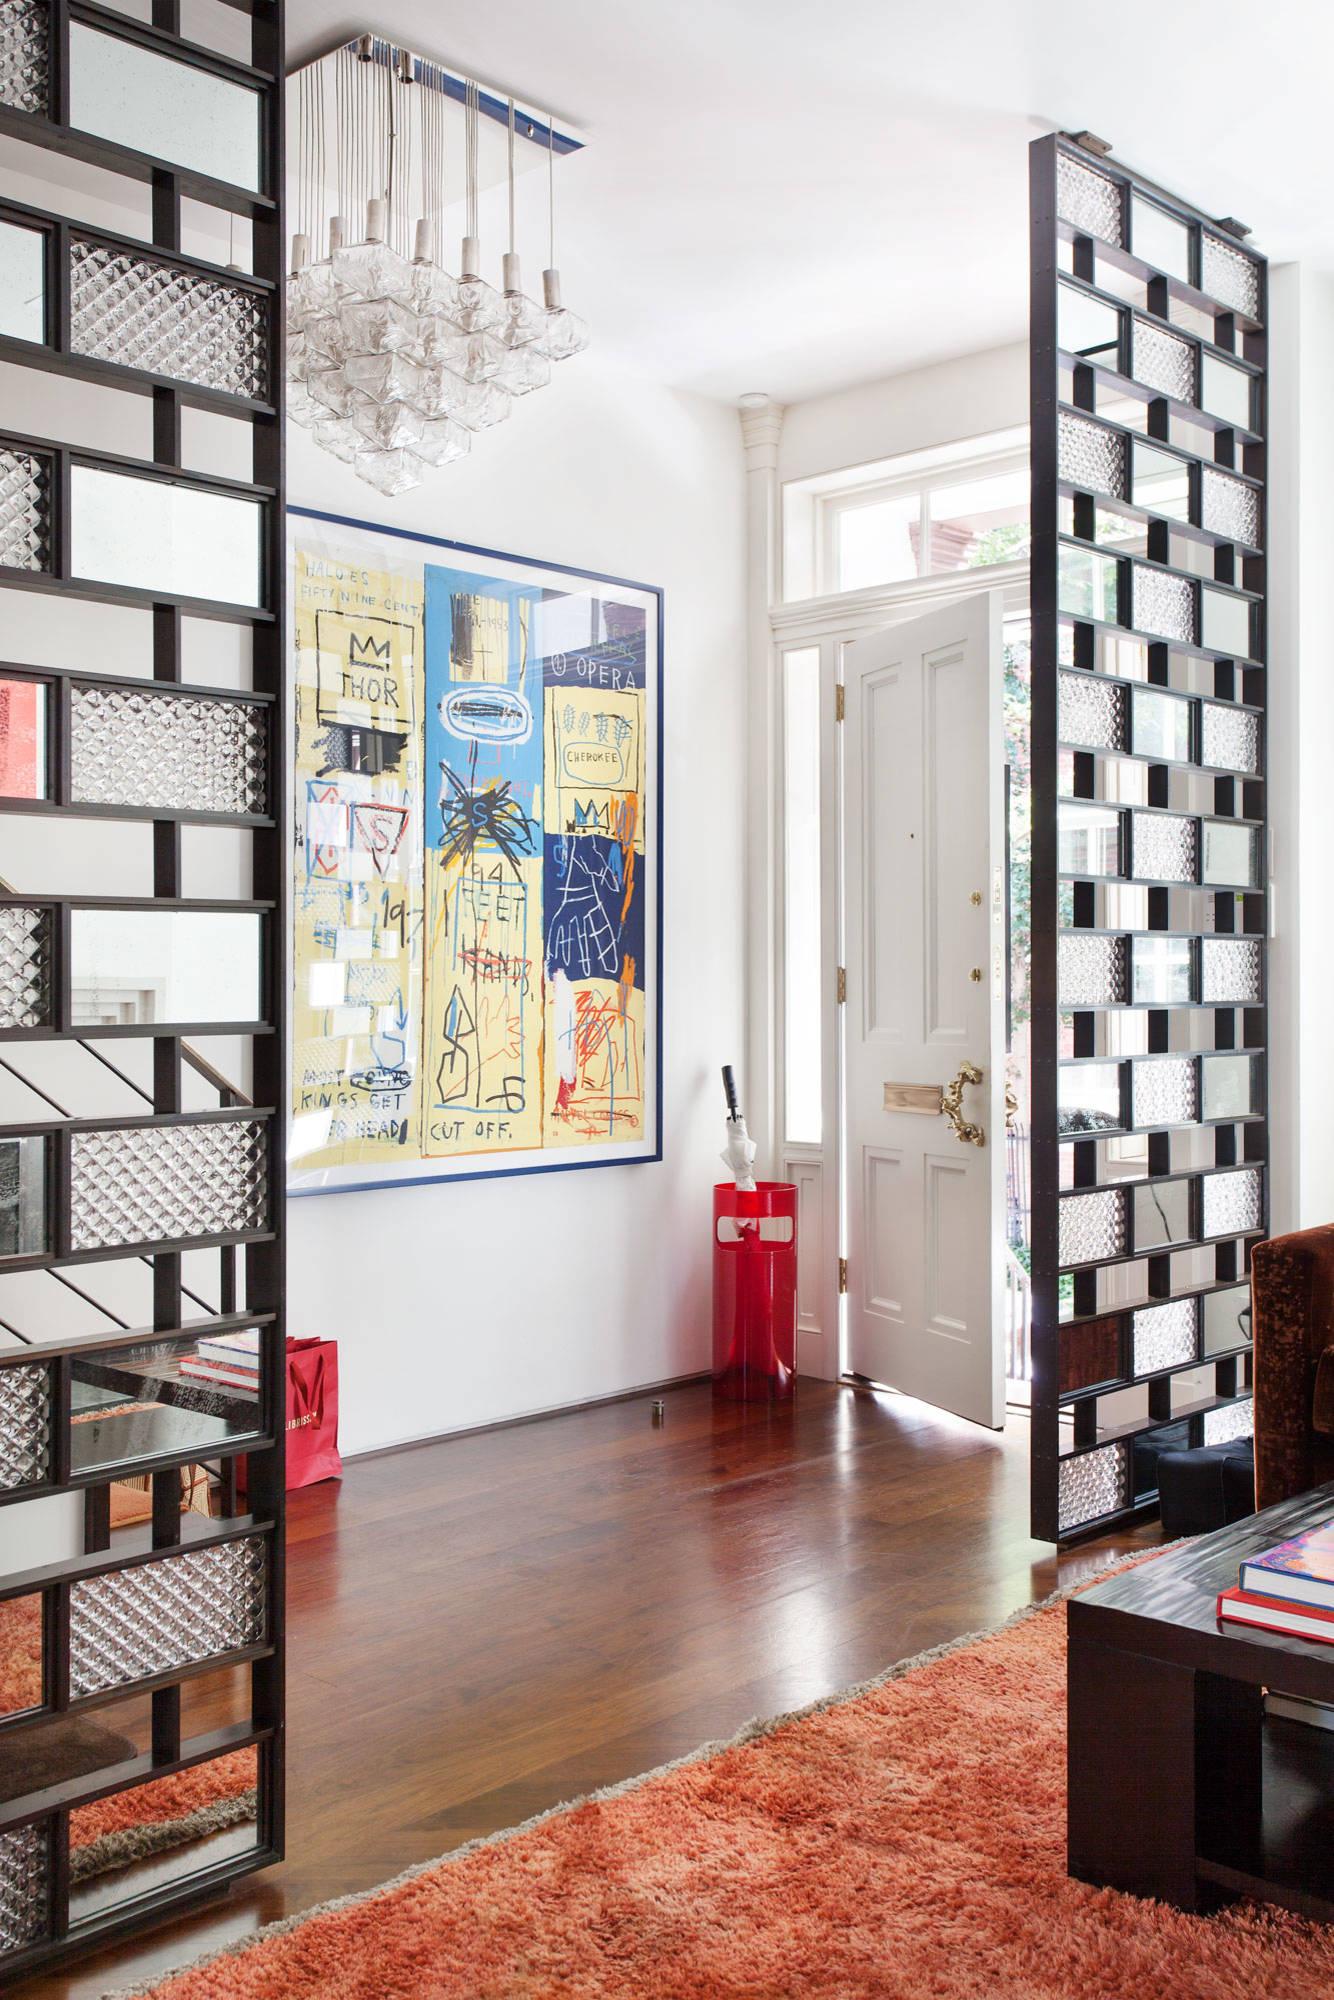 Biombos estilo moderno en sala de estar.